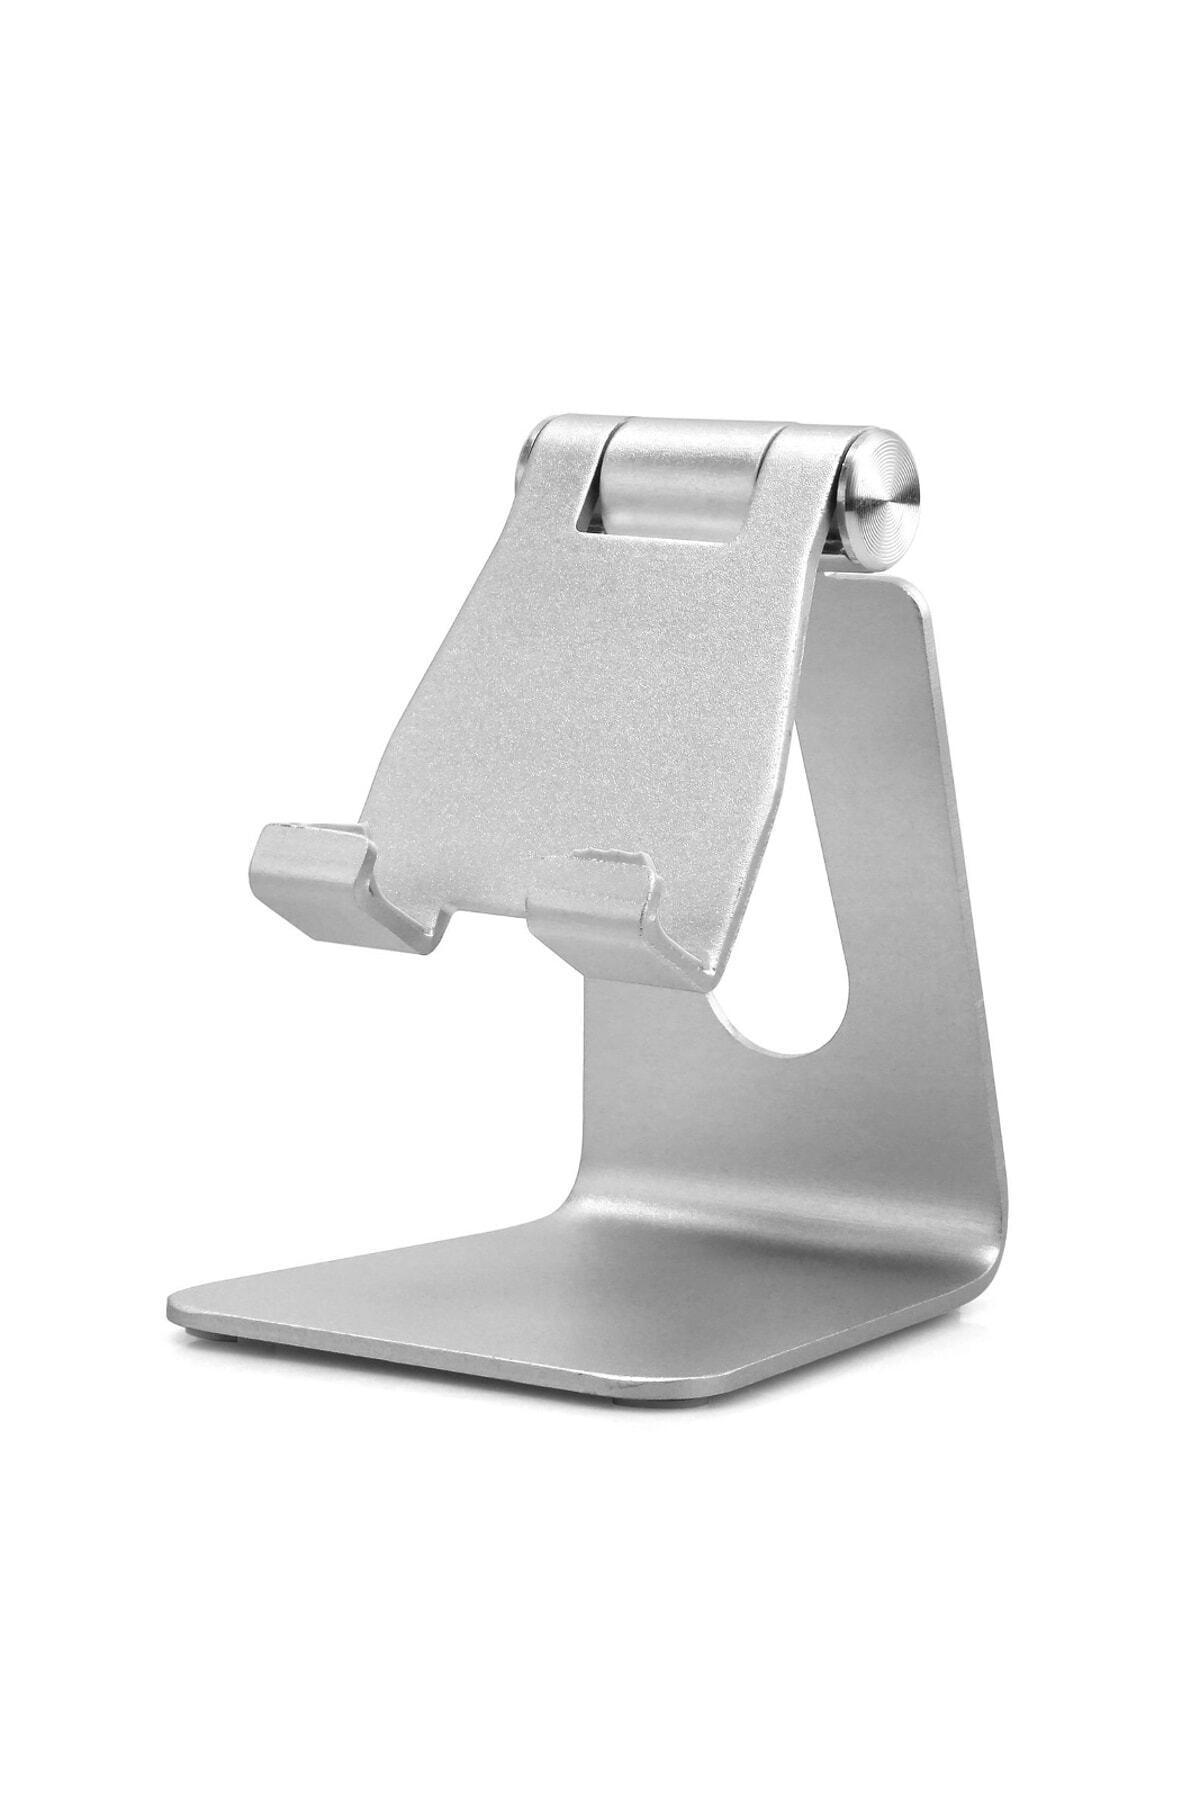 Techmaster Sec-on Metal Telefon Tablet Stand Masaüstü Ayarlanabilir Dock Standı 1